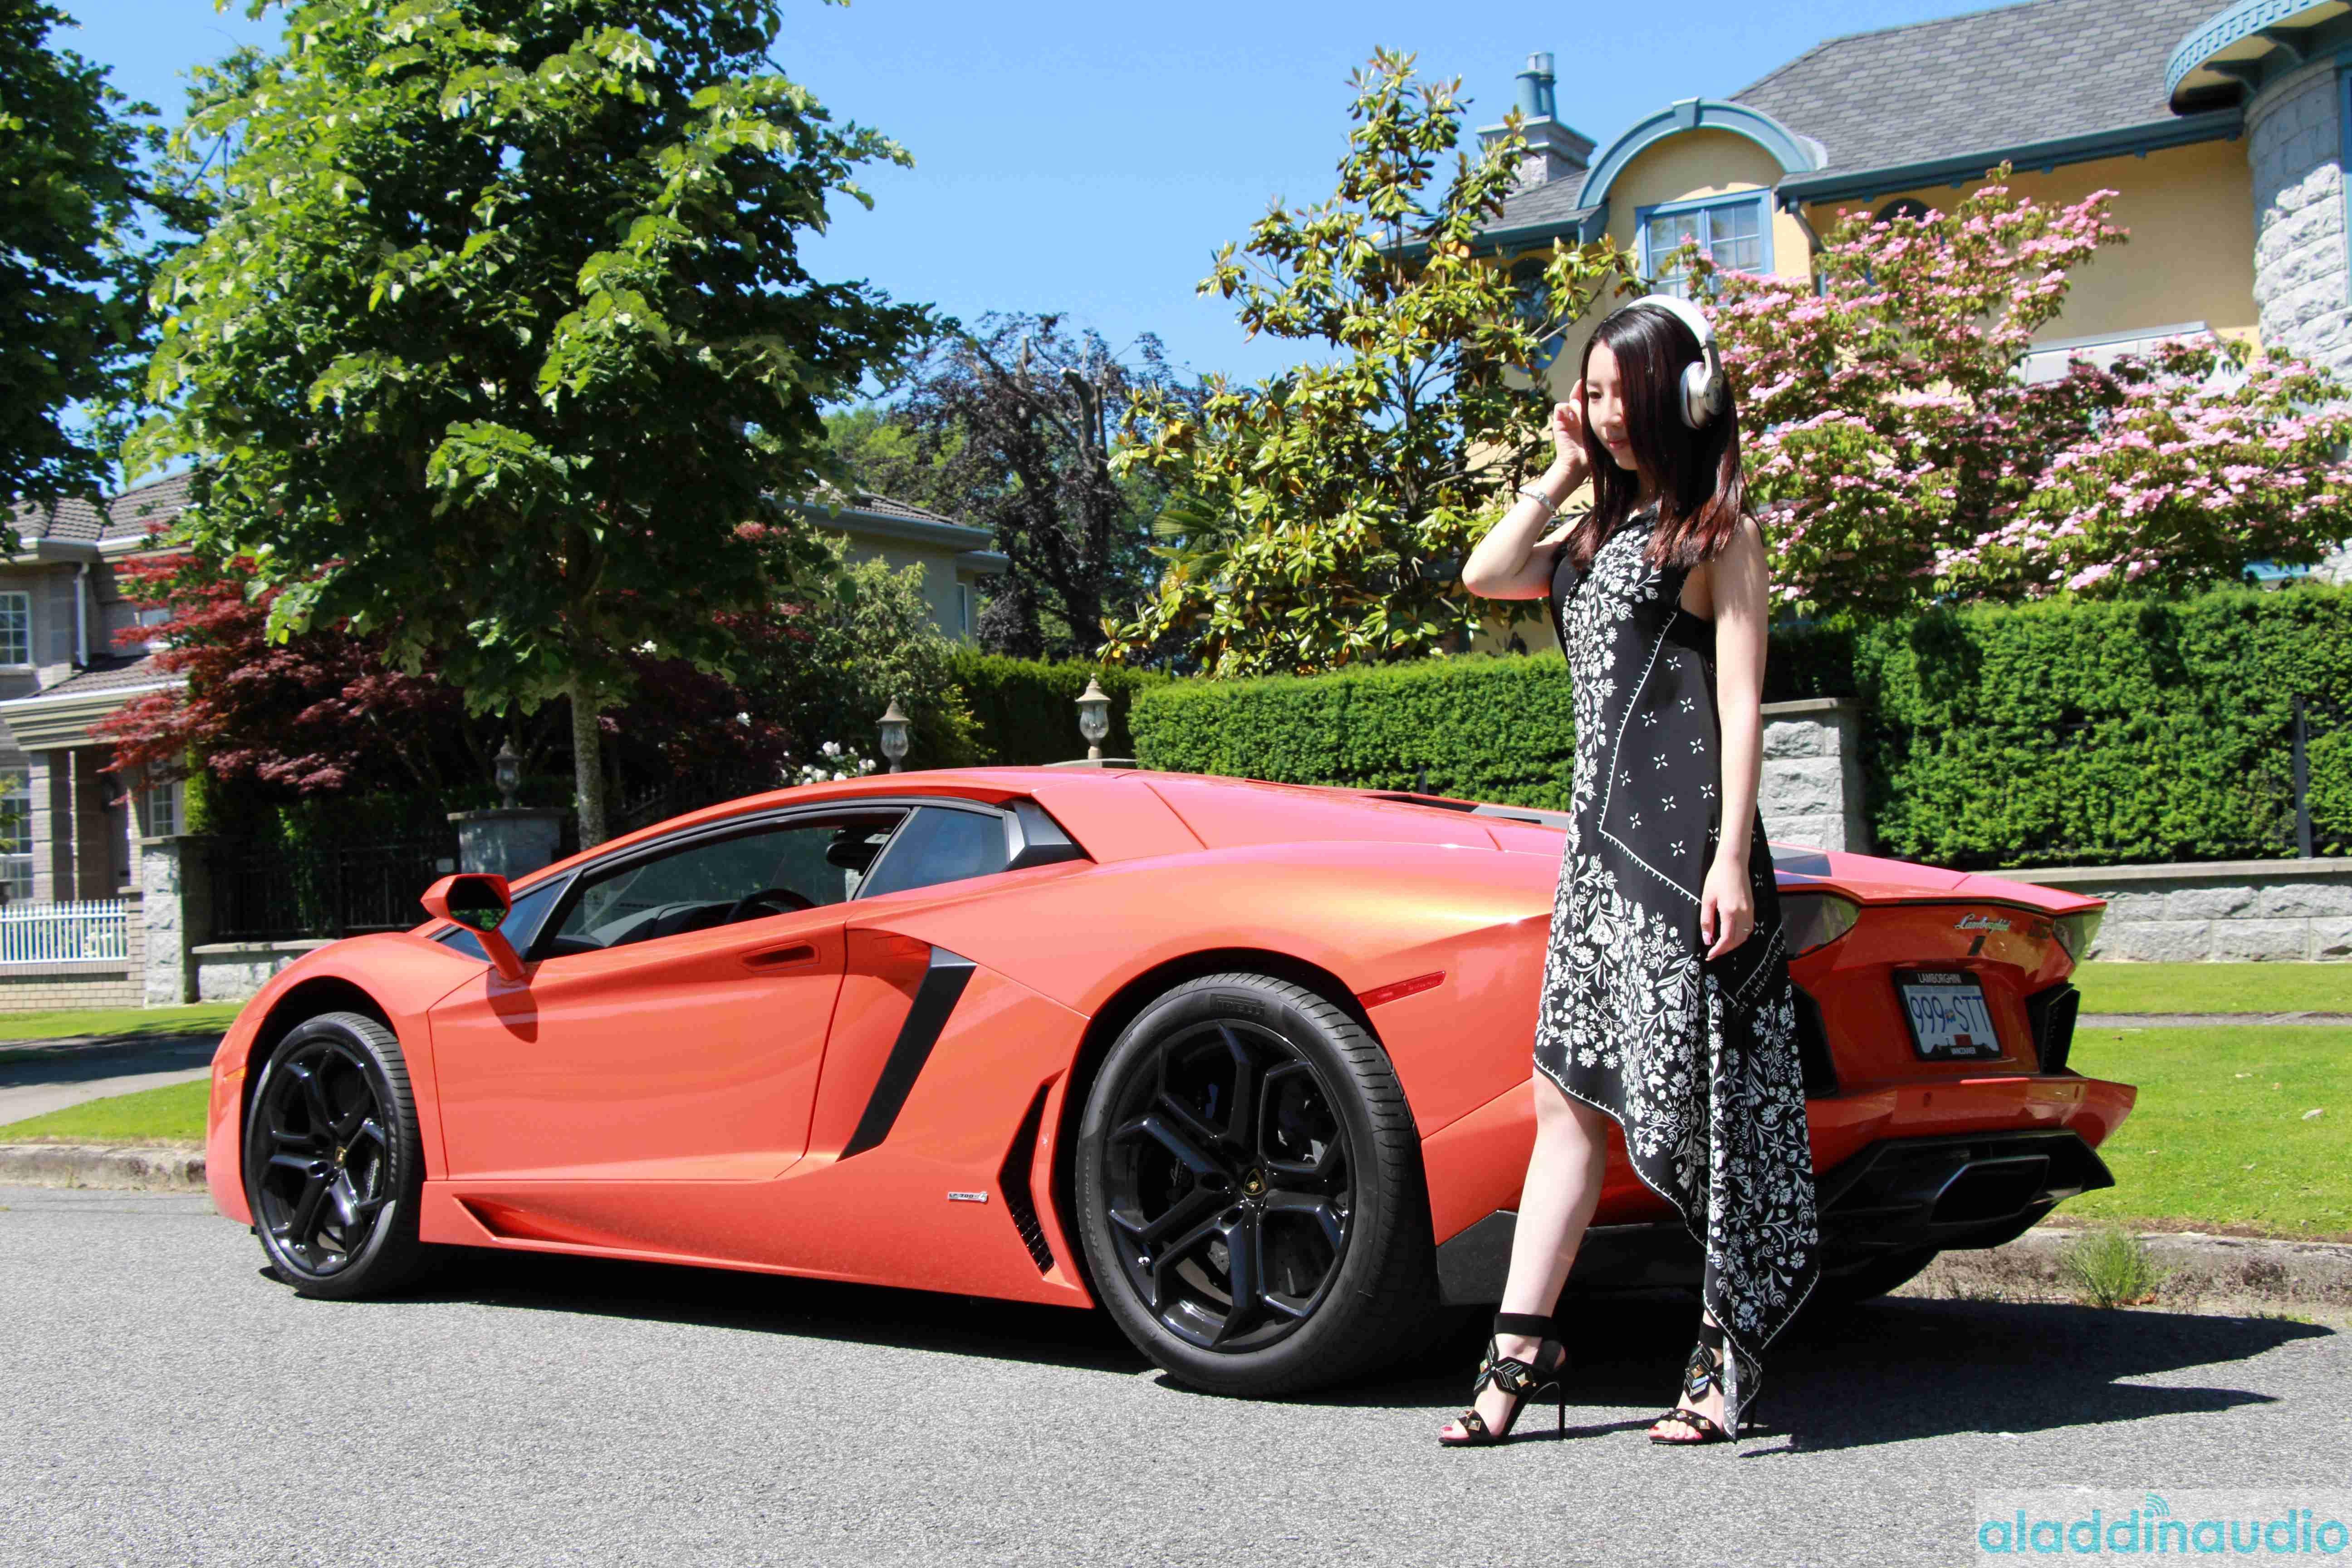 #lamborghini pictures Lamborghini girls